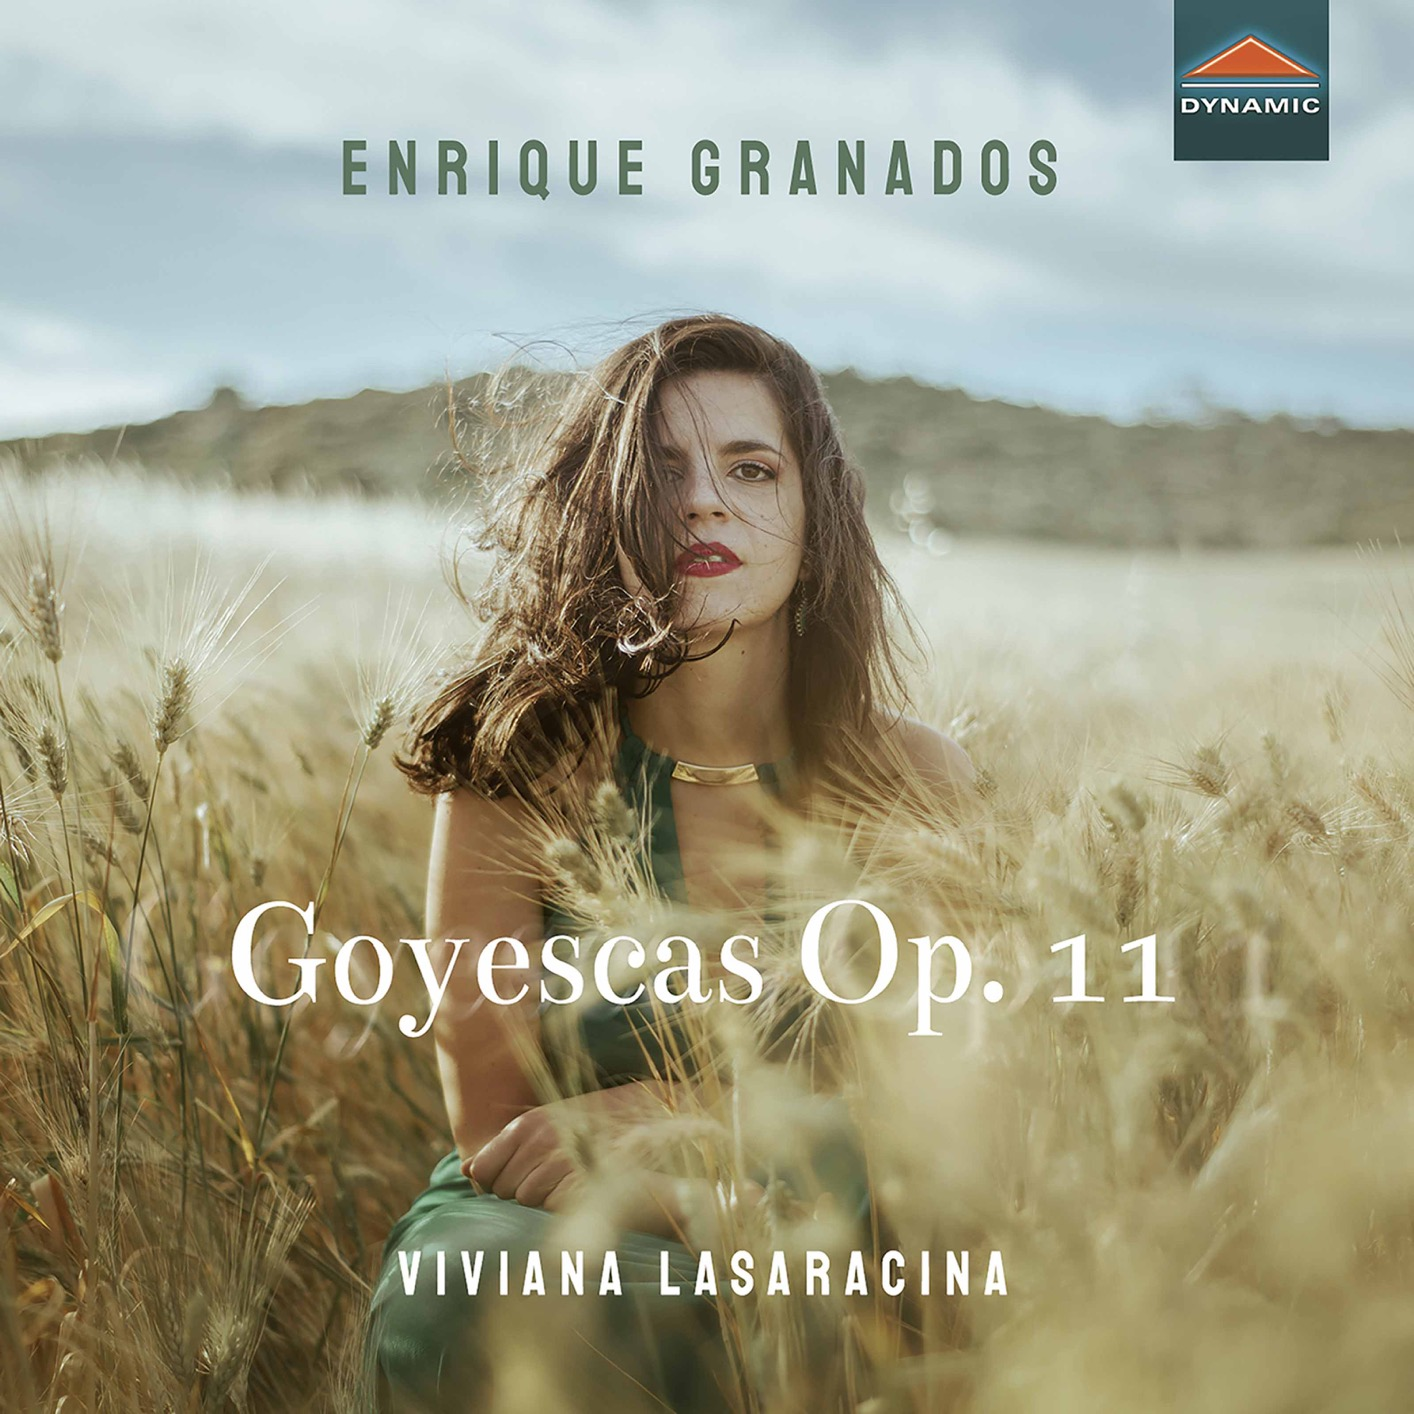 Review of GRANADOS Goyescas (Viviana Lasaracina)